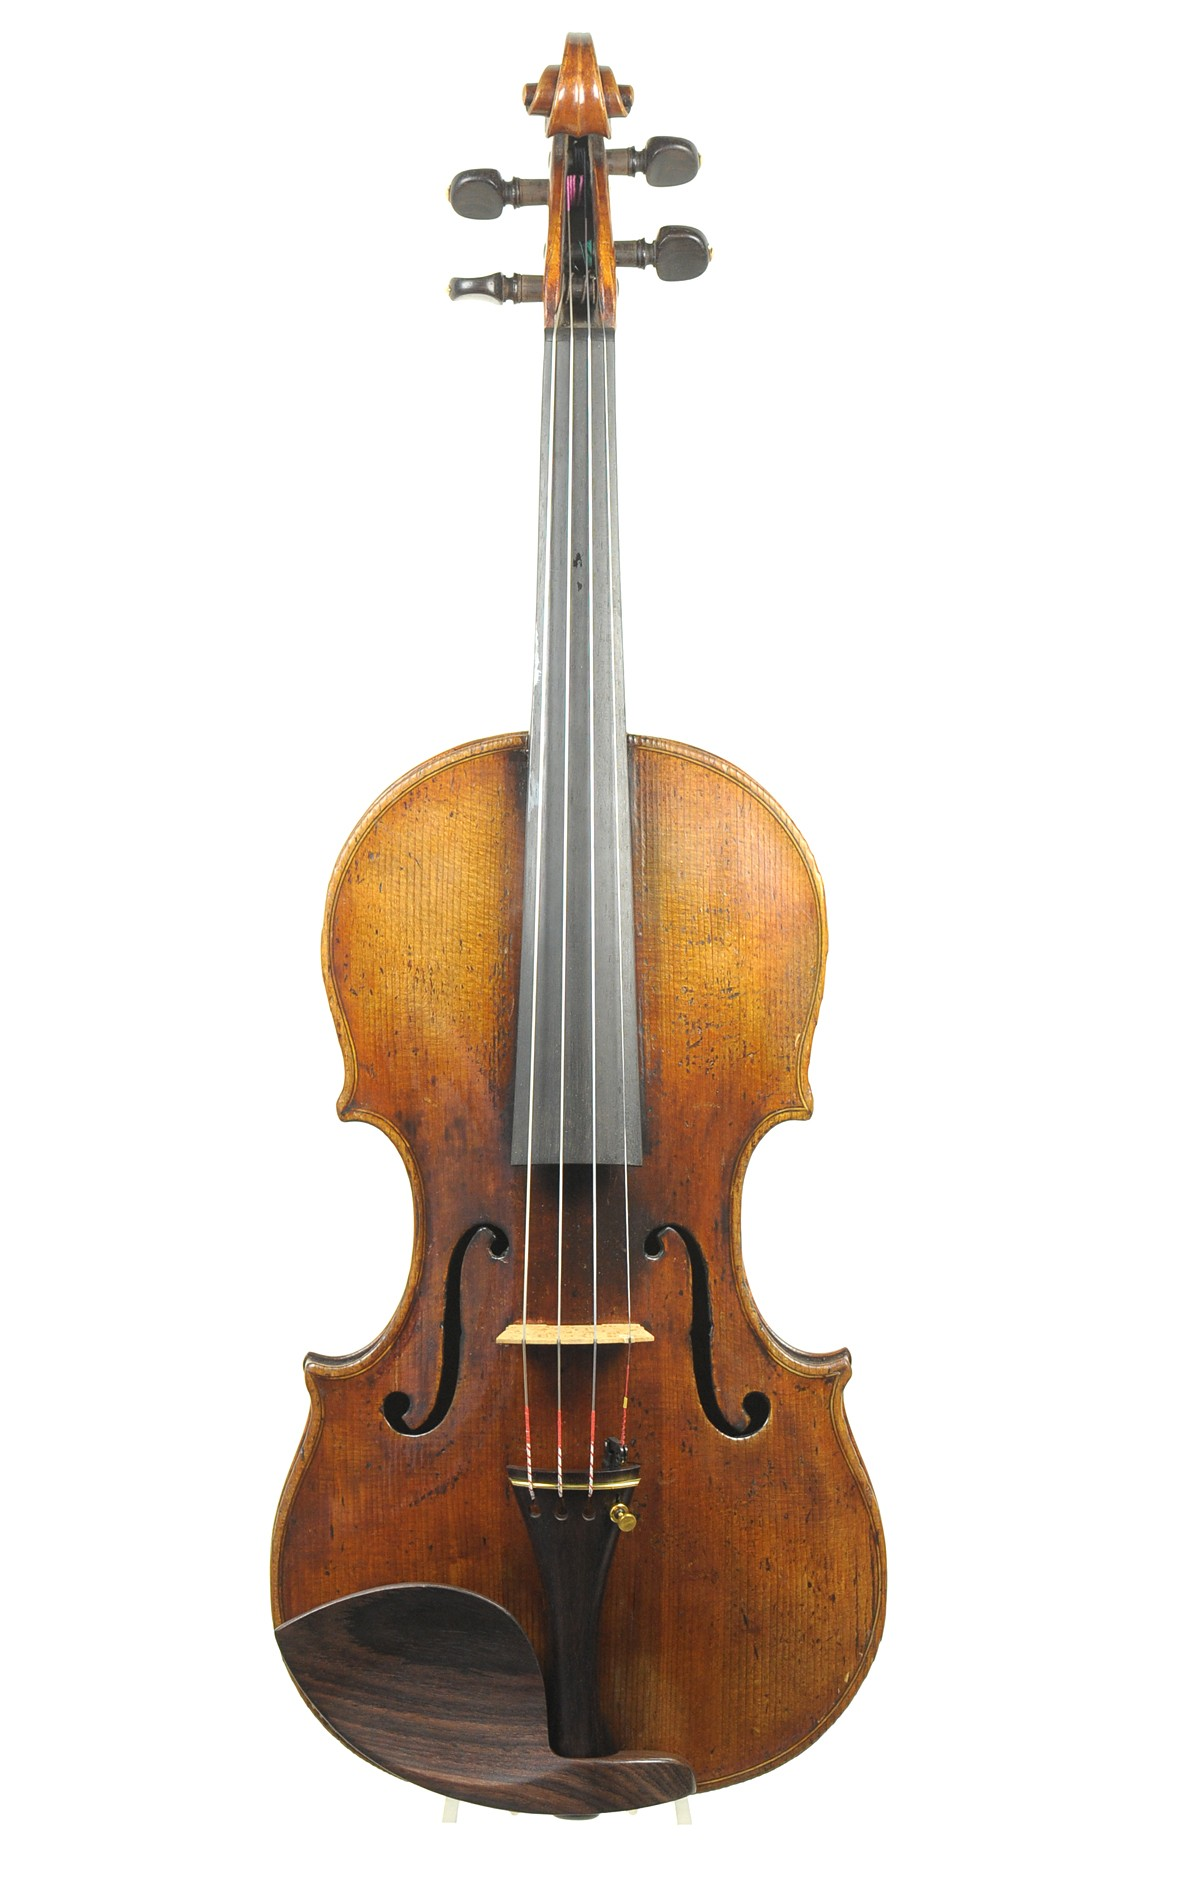 German master violin, Michele Deconet copy - spruce top